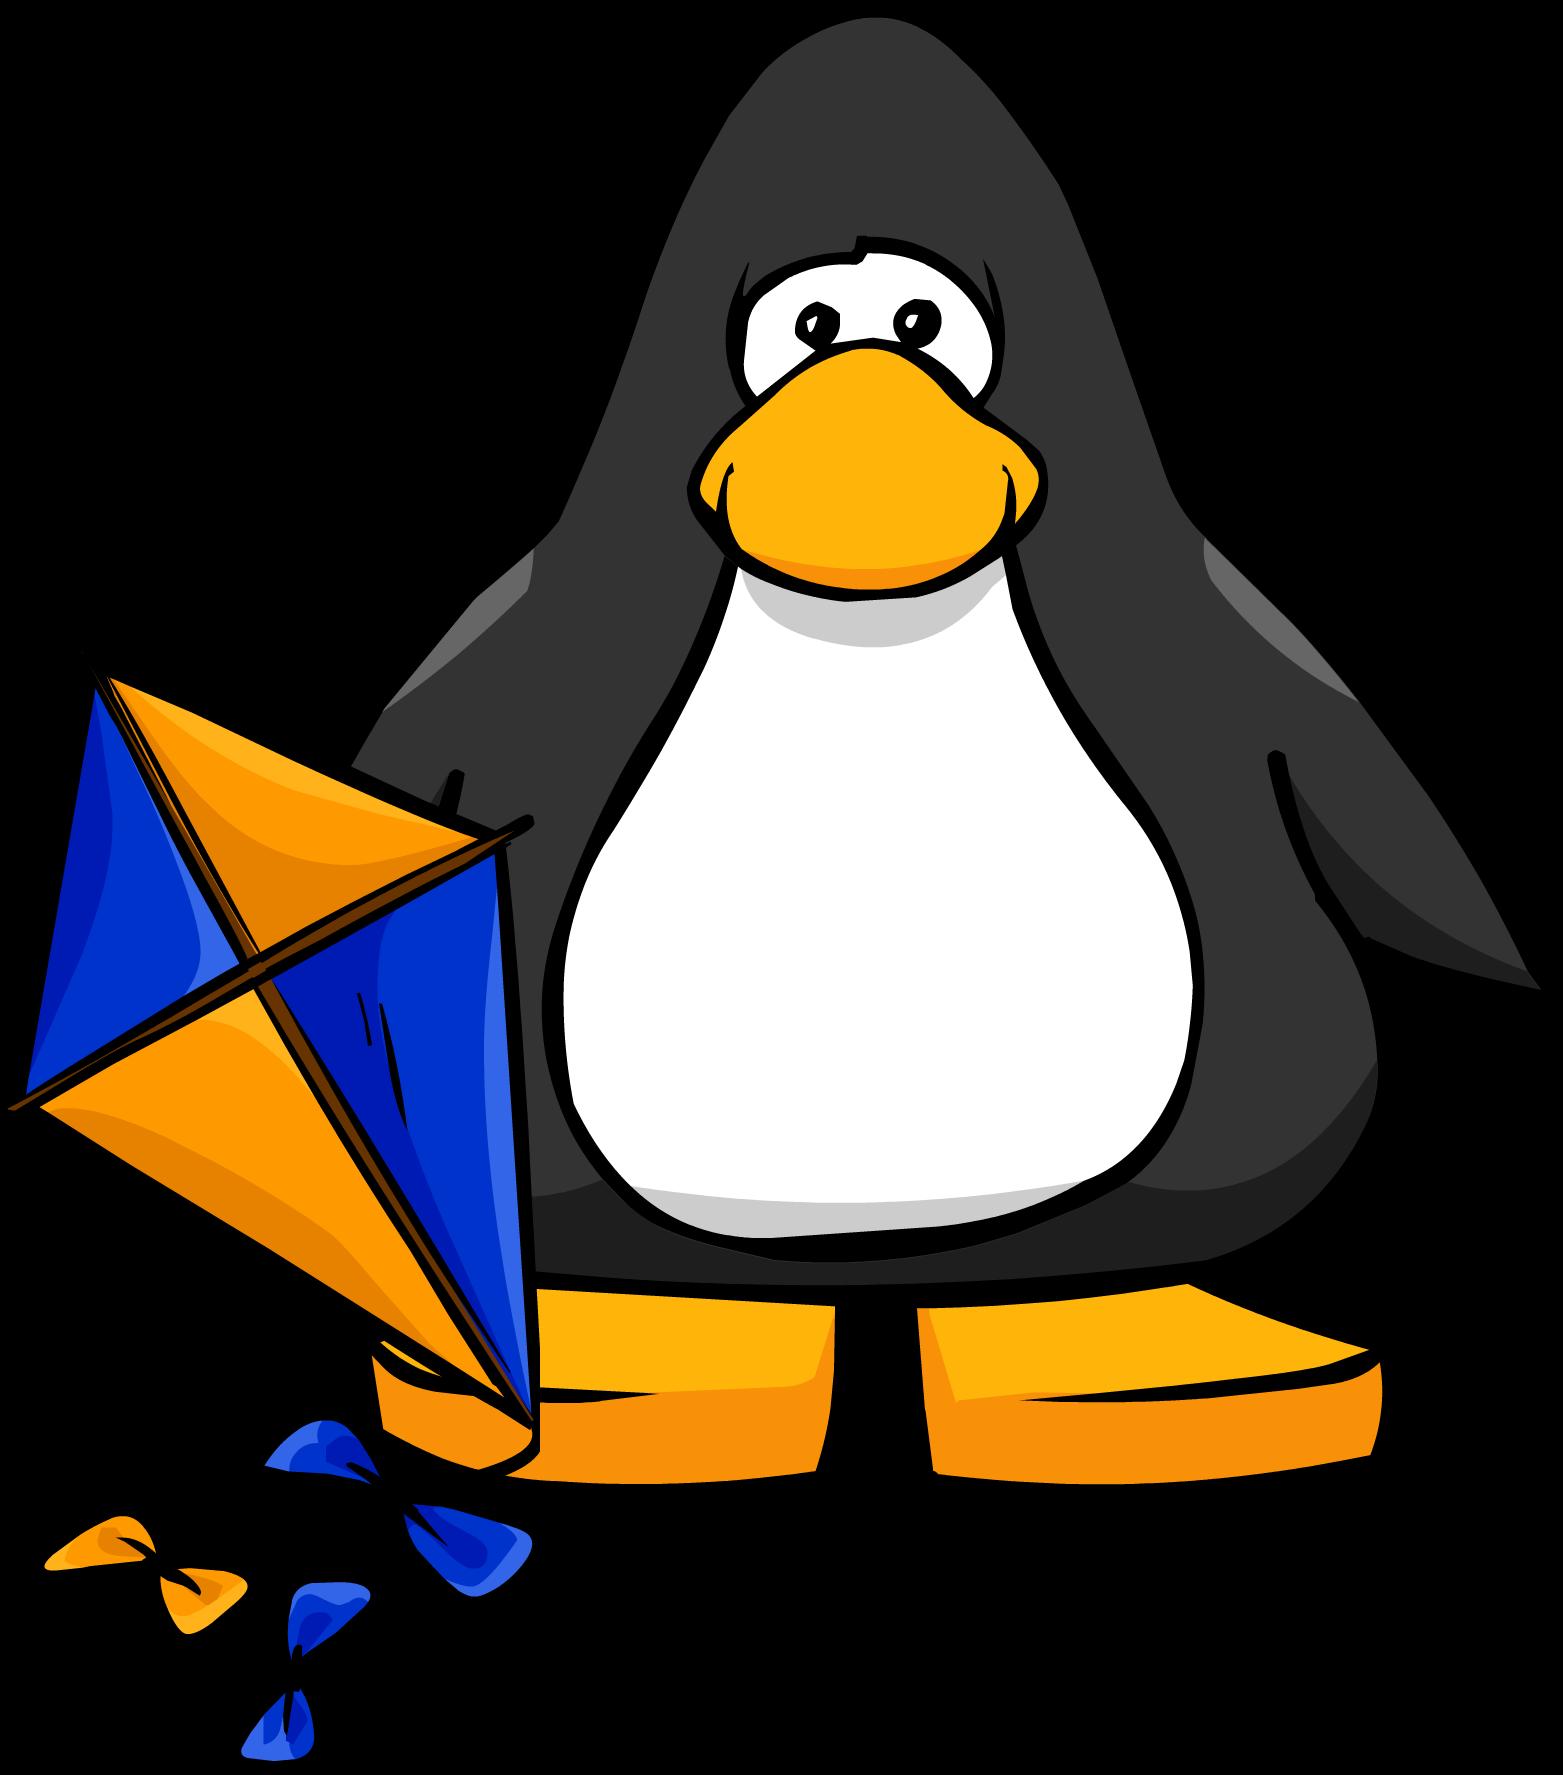 Kite PC